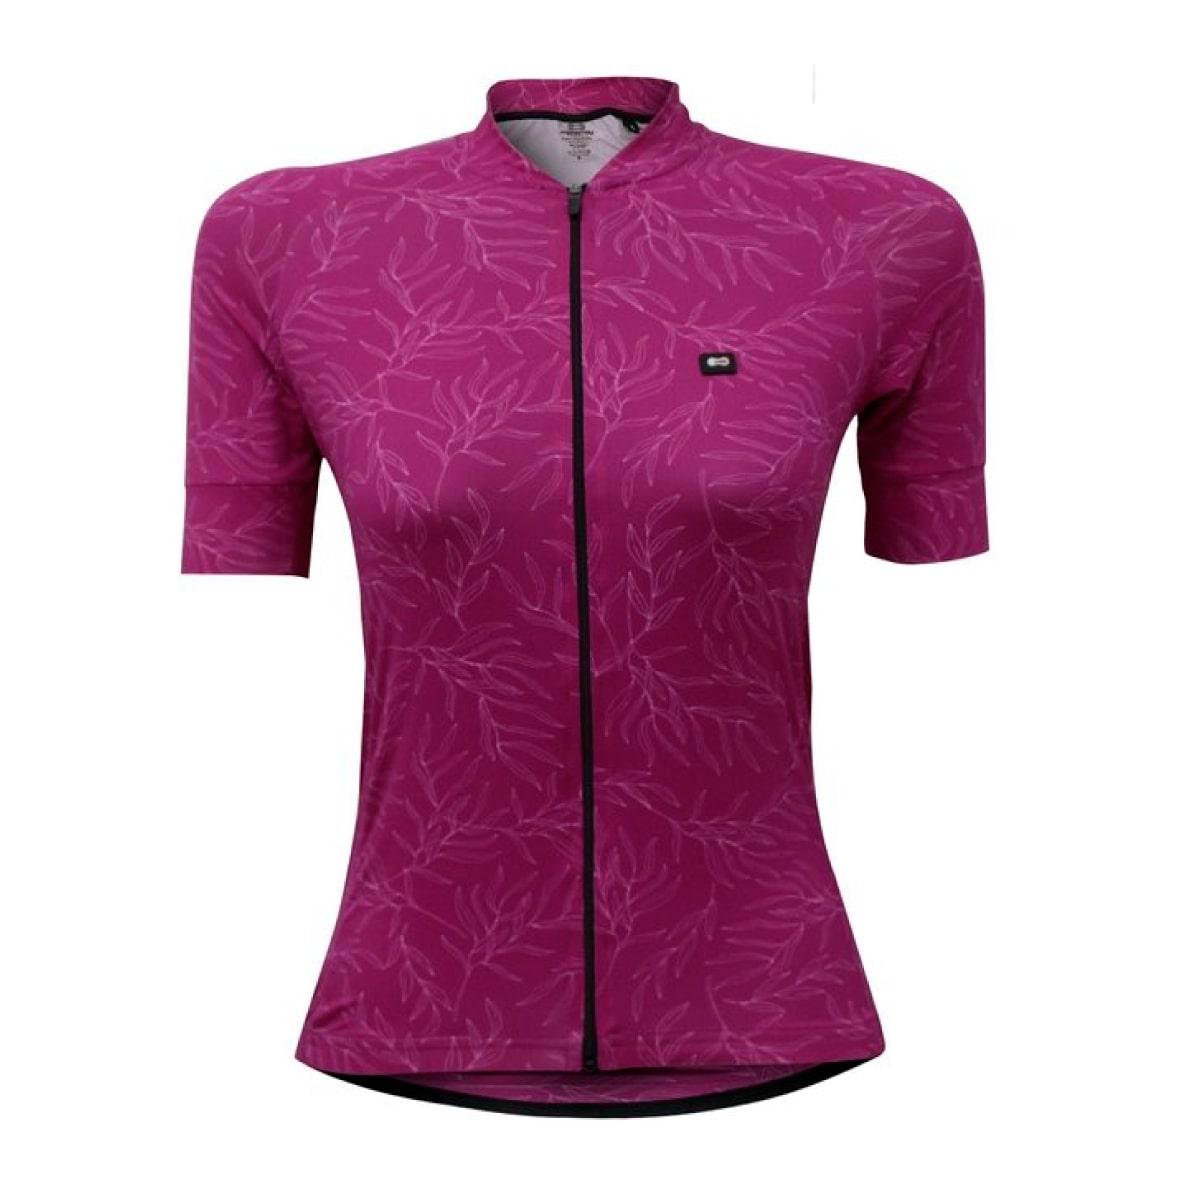 Camisa Feminina Marcio May Funny Pink Coupe